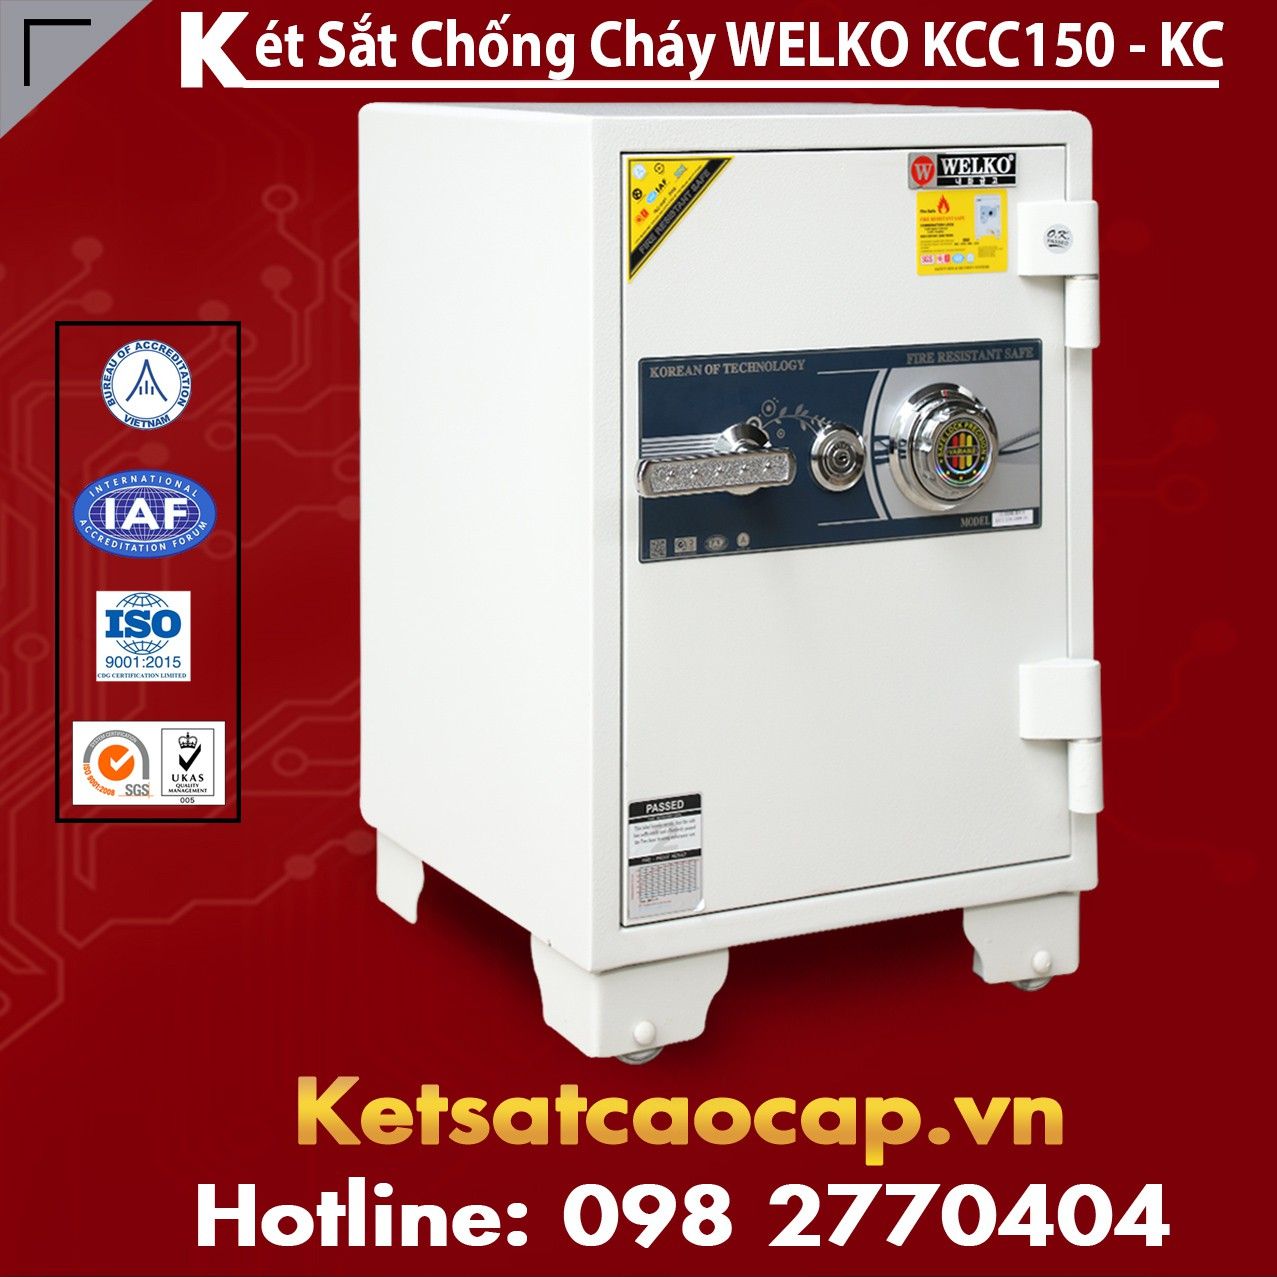 Mua Két Sắt KCC150 White - KC